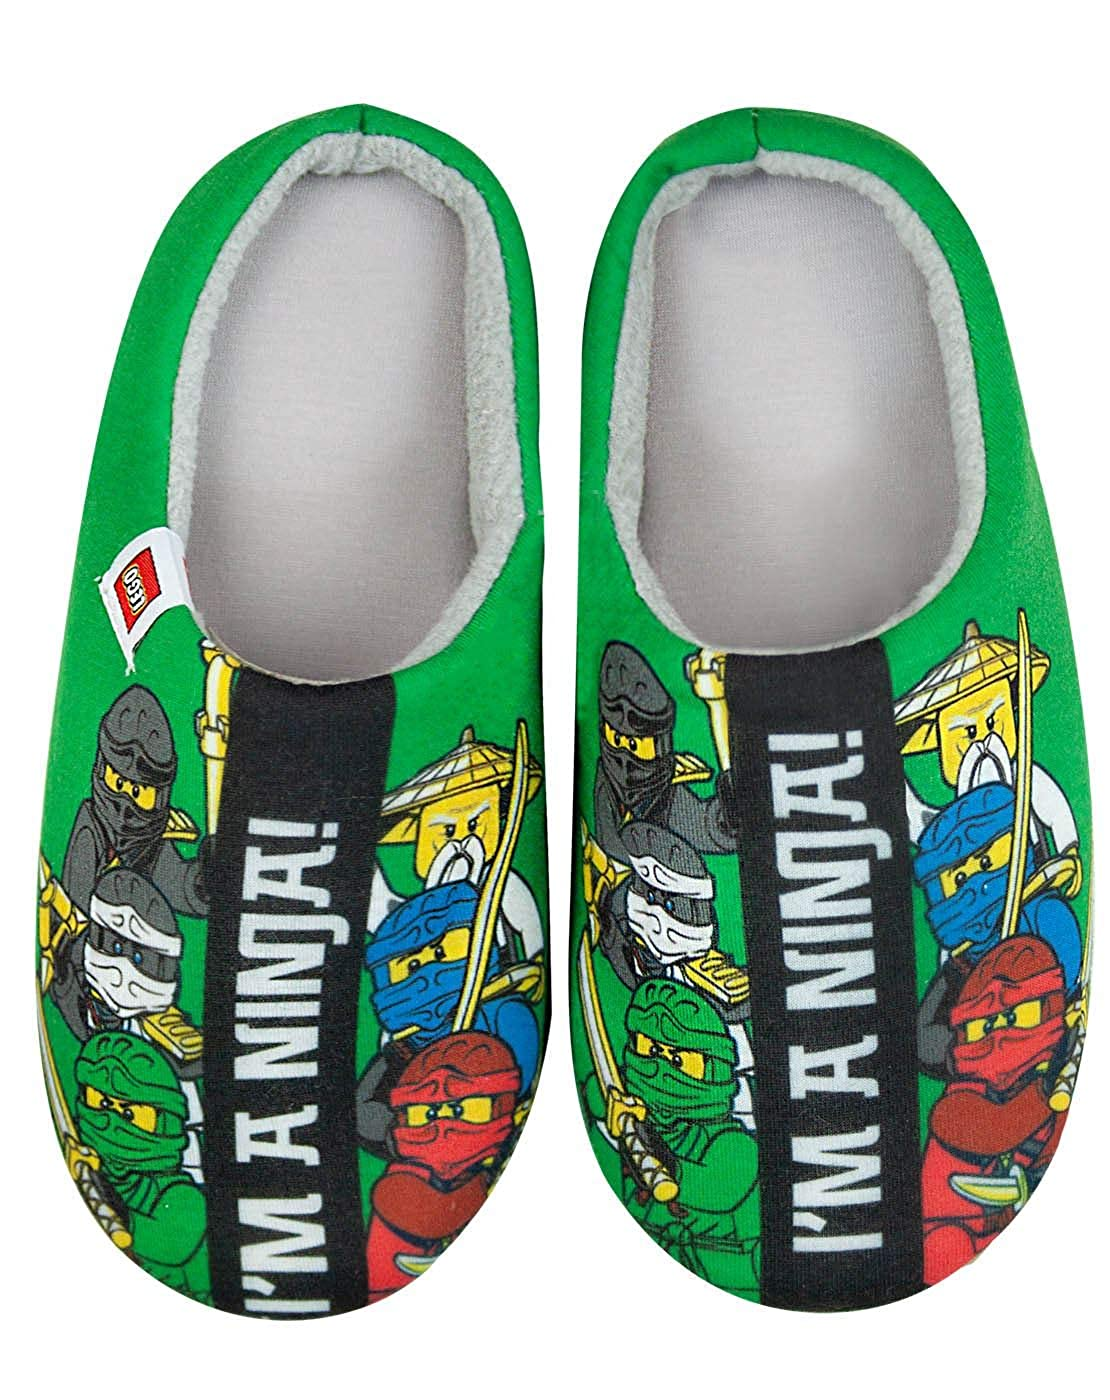 Lego Ninjago Im A Ninja Boys Slippers: Amazon.es: Zapatos y ...